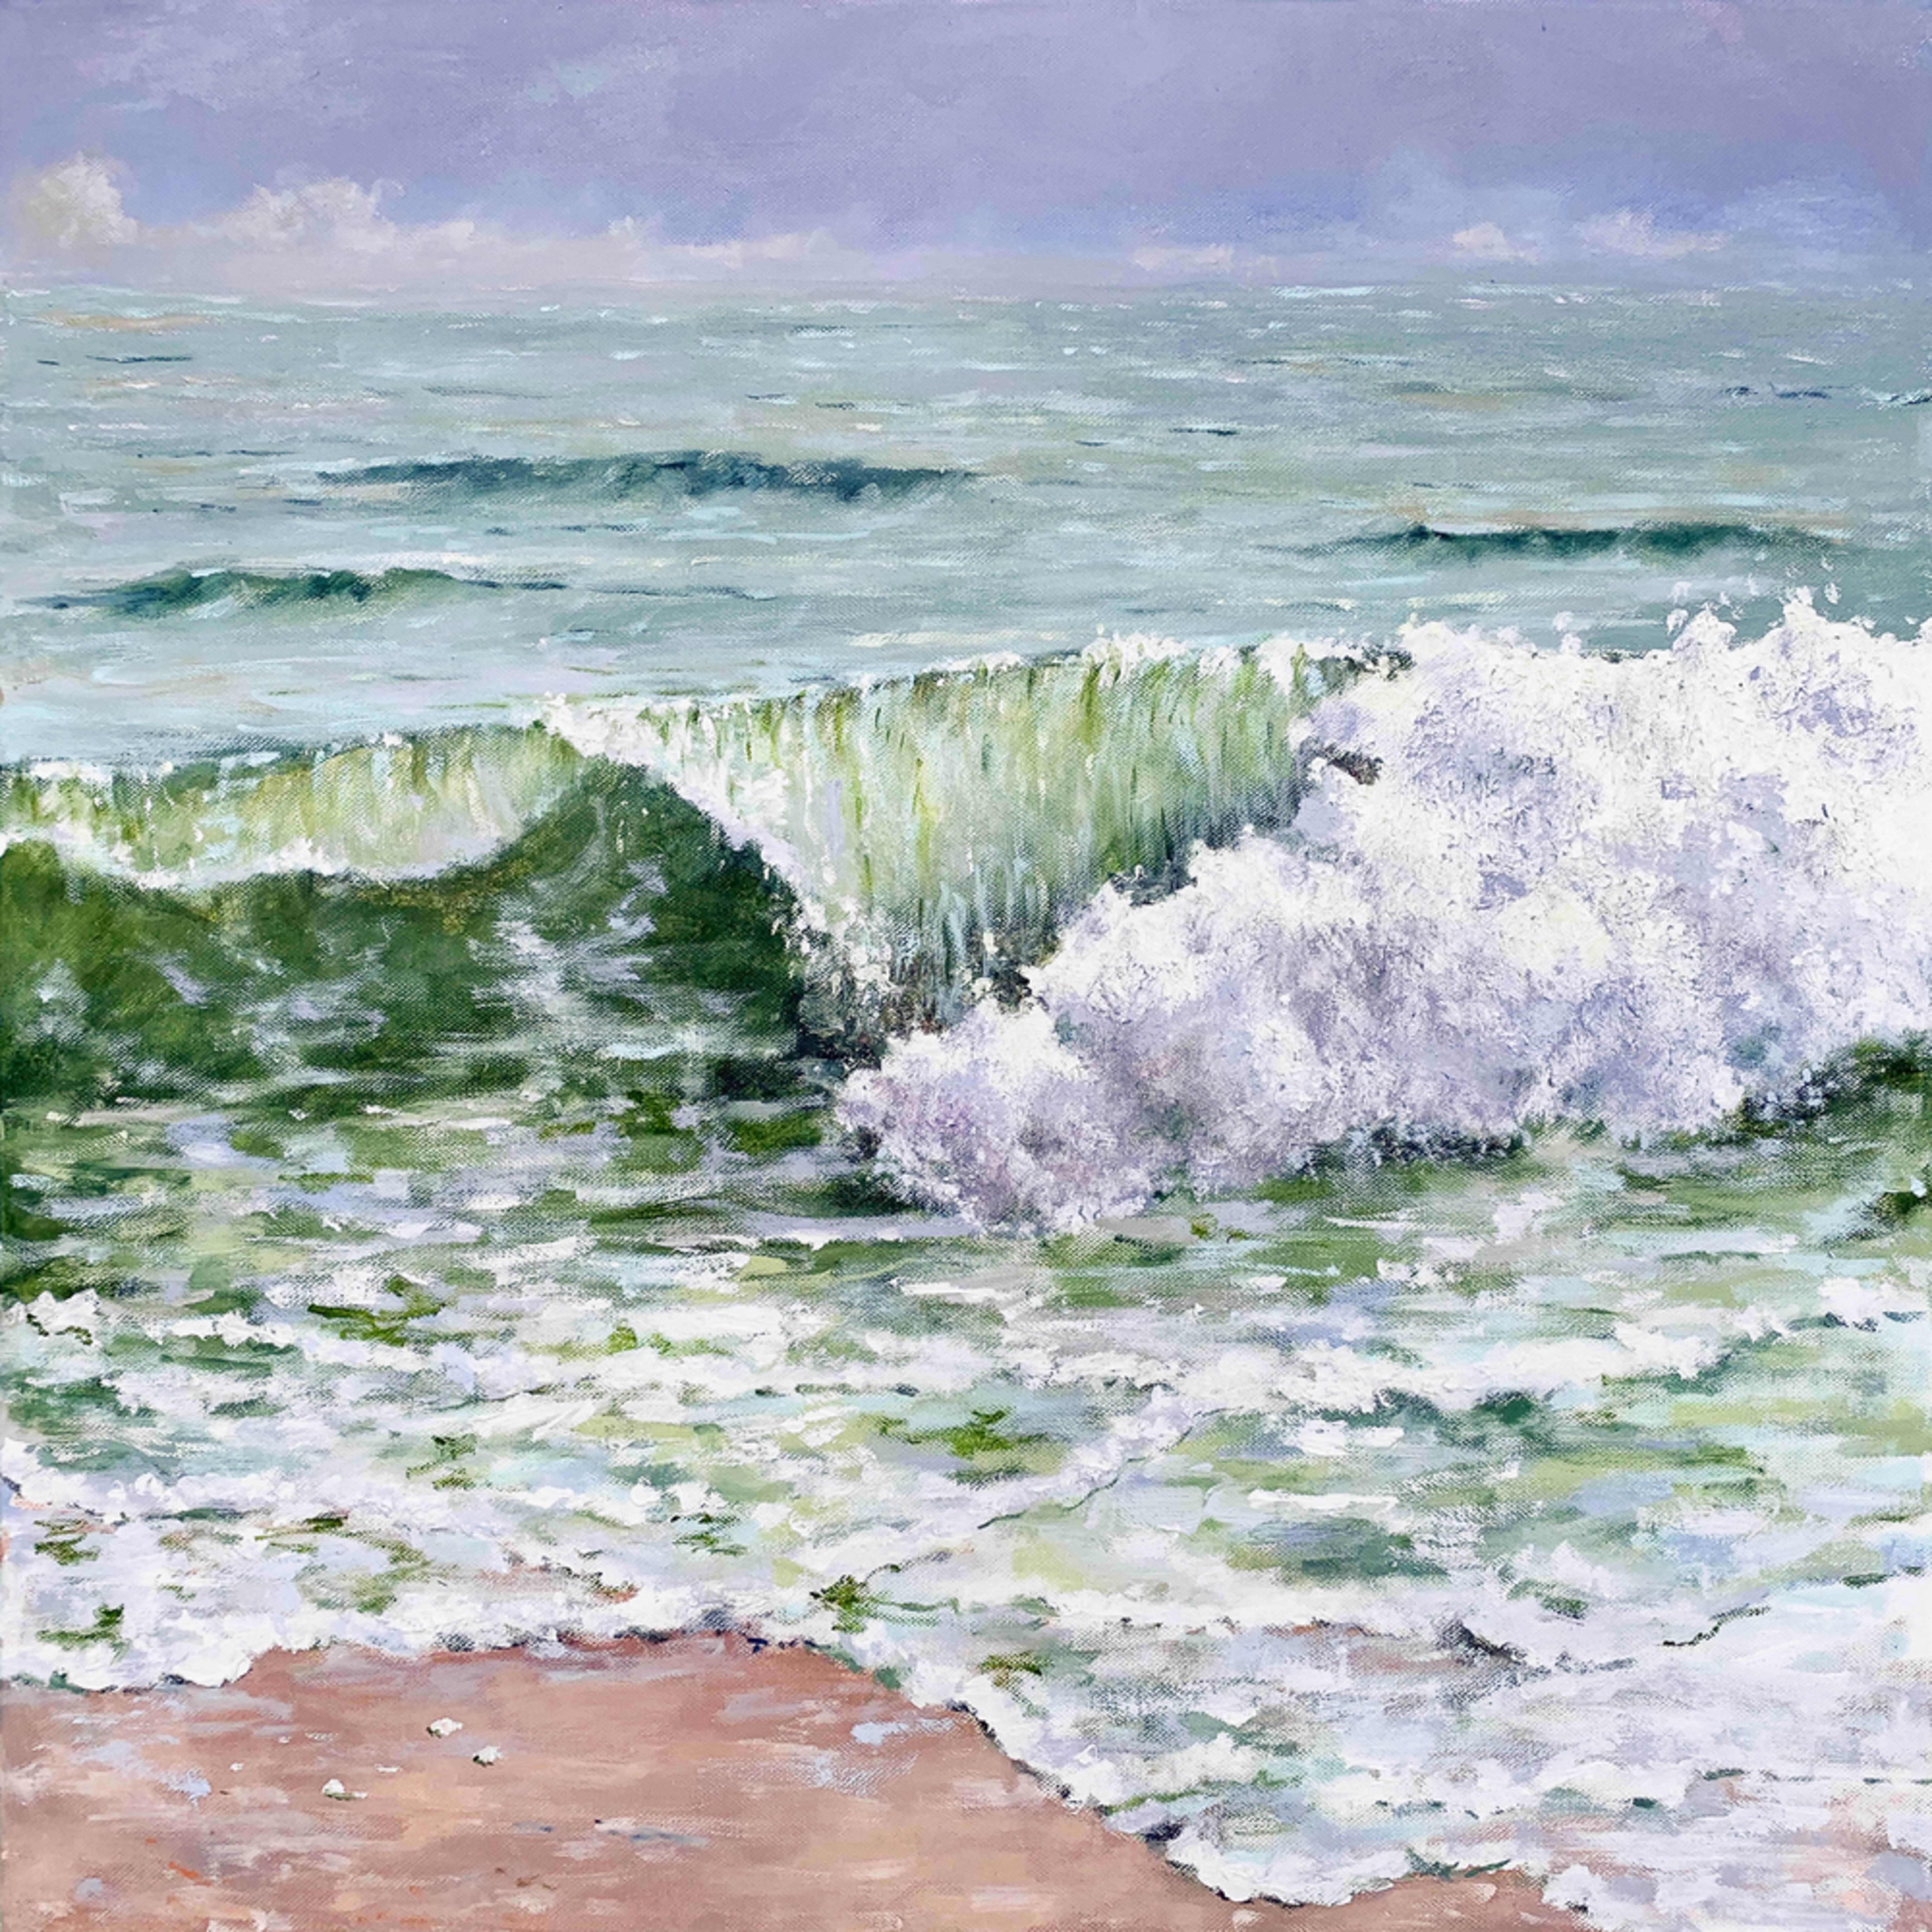 Emerald tide by chris doyle uwm9d7